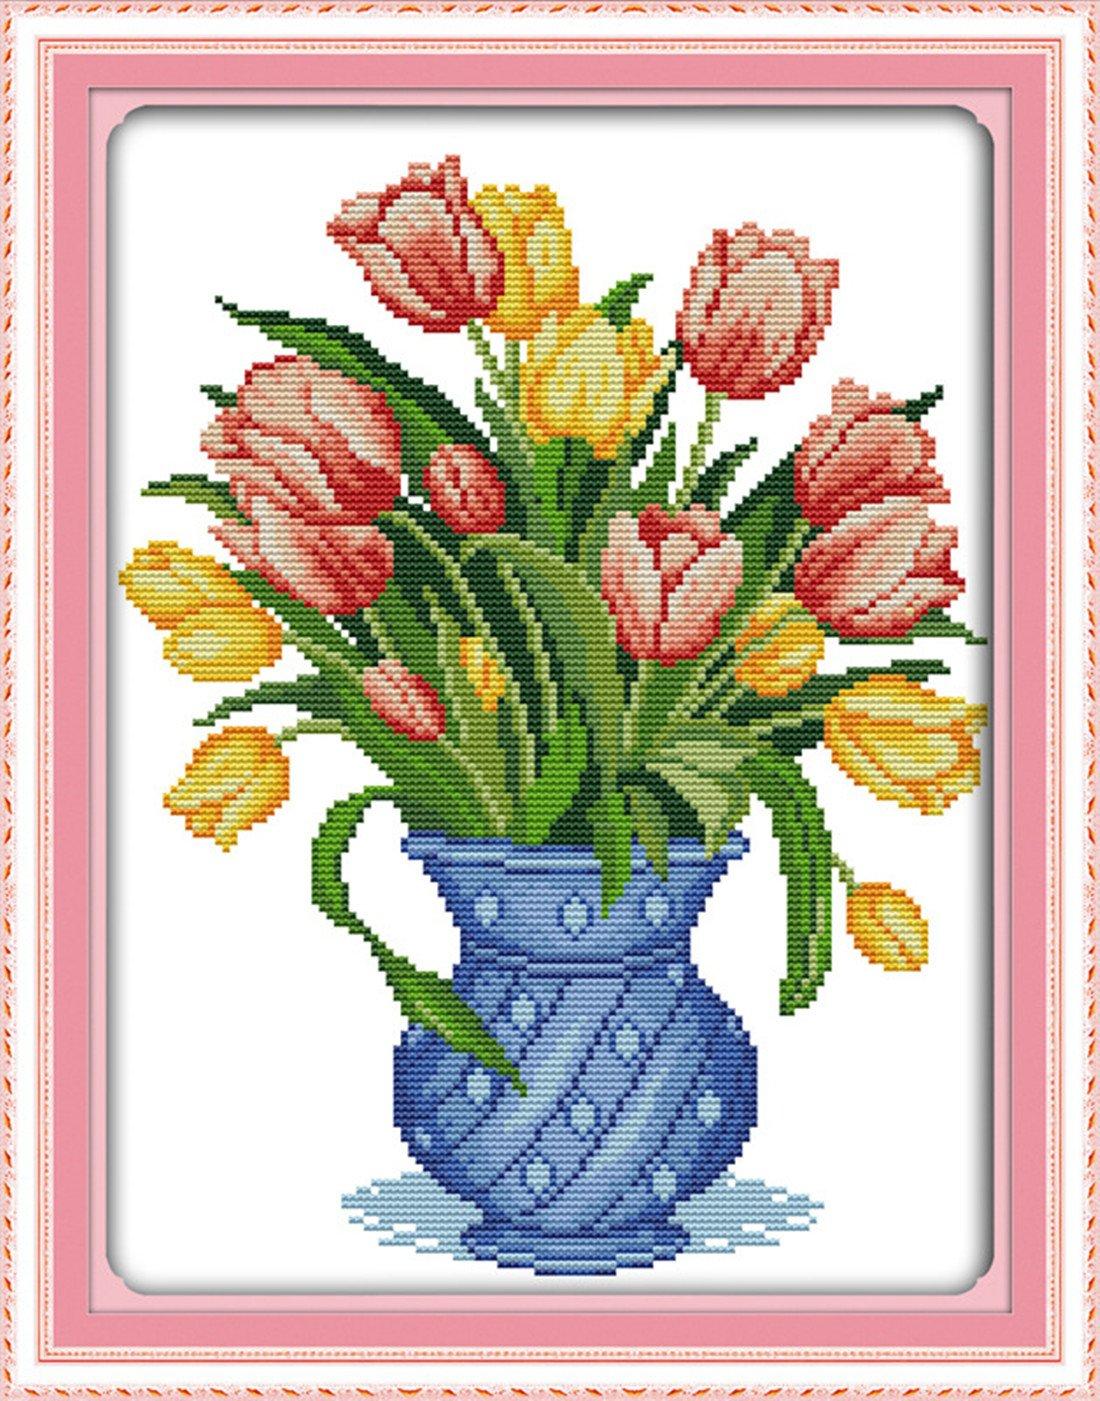 Amazon egoodn stamped cross stitch kits with printed pattern amazon egoodn stamped cross stitch kits with printed pattern flower tulip vase 146 x 185 11ct aida fabric for embroidery art cross stitching nvjuhfo Gallery